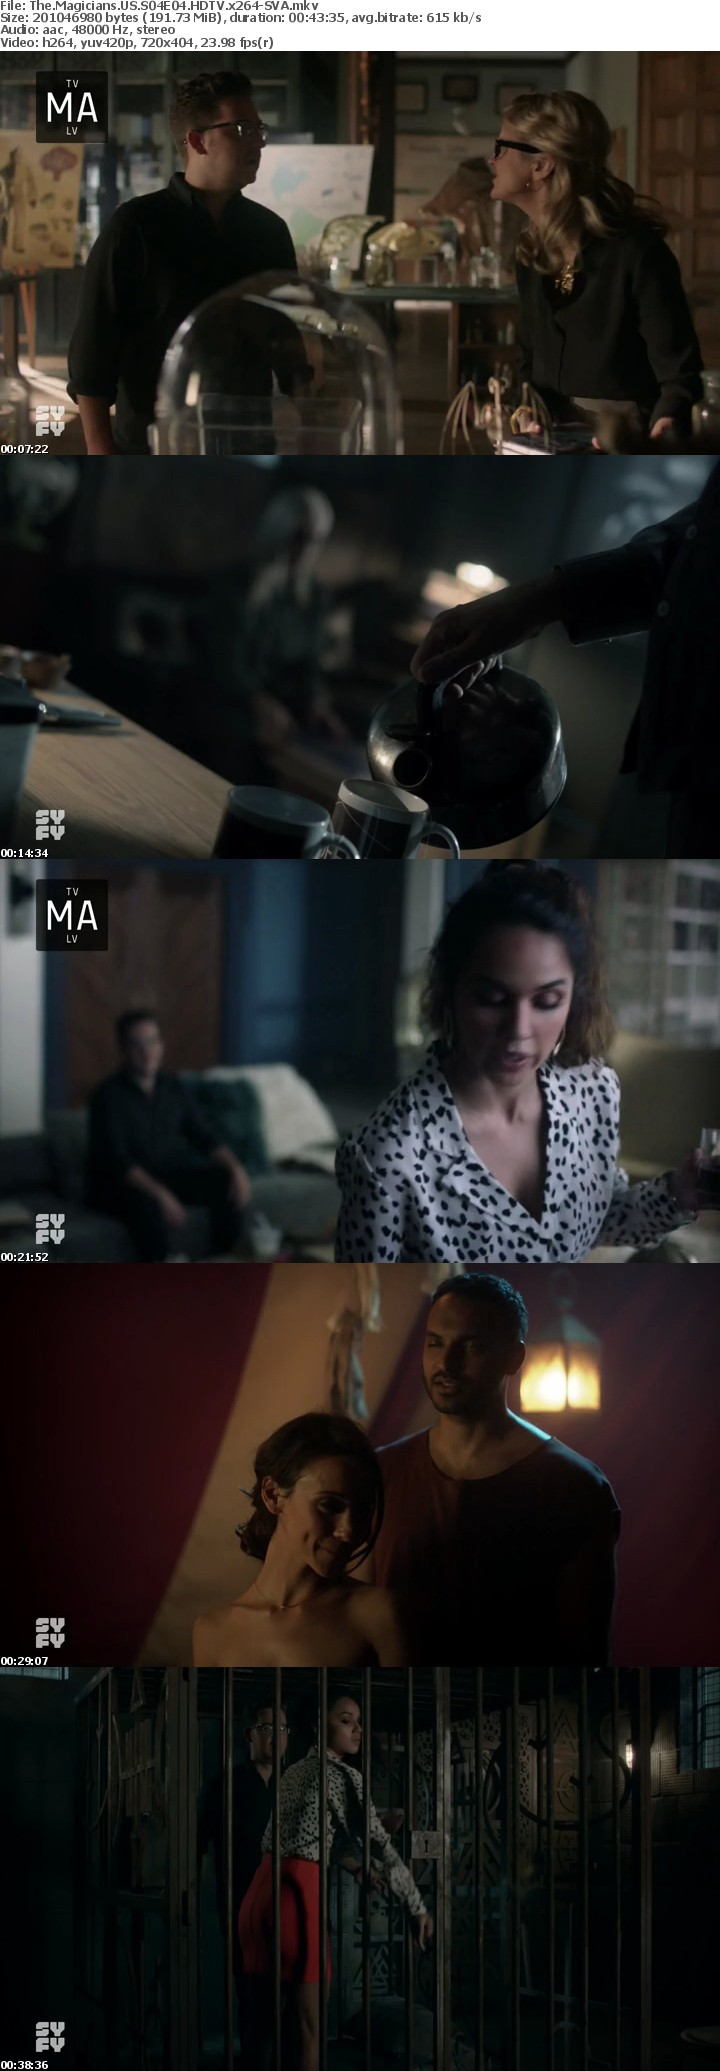 The Magicians US S04E04 HDTV x264-SVA